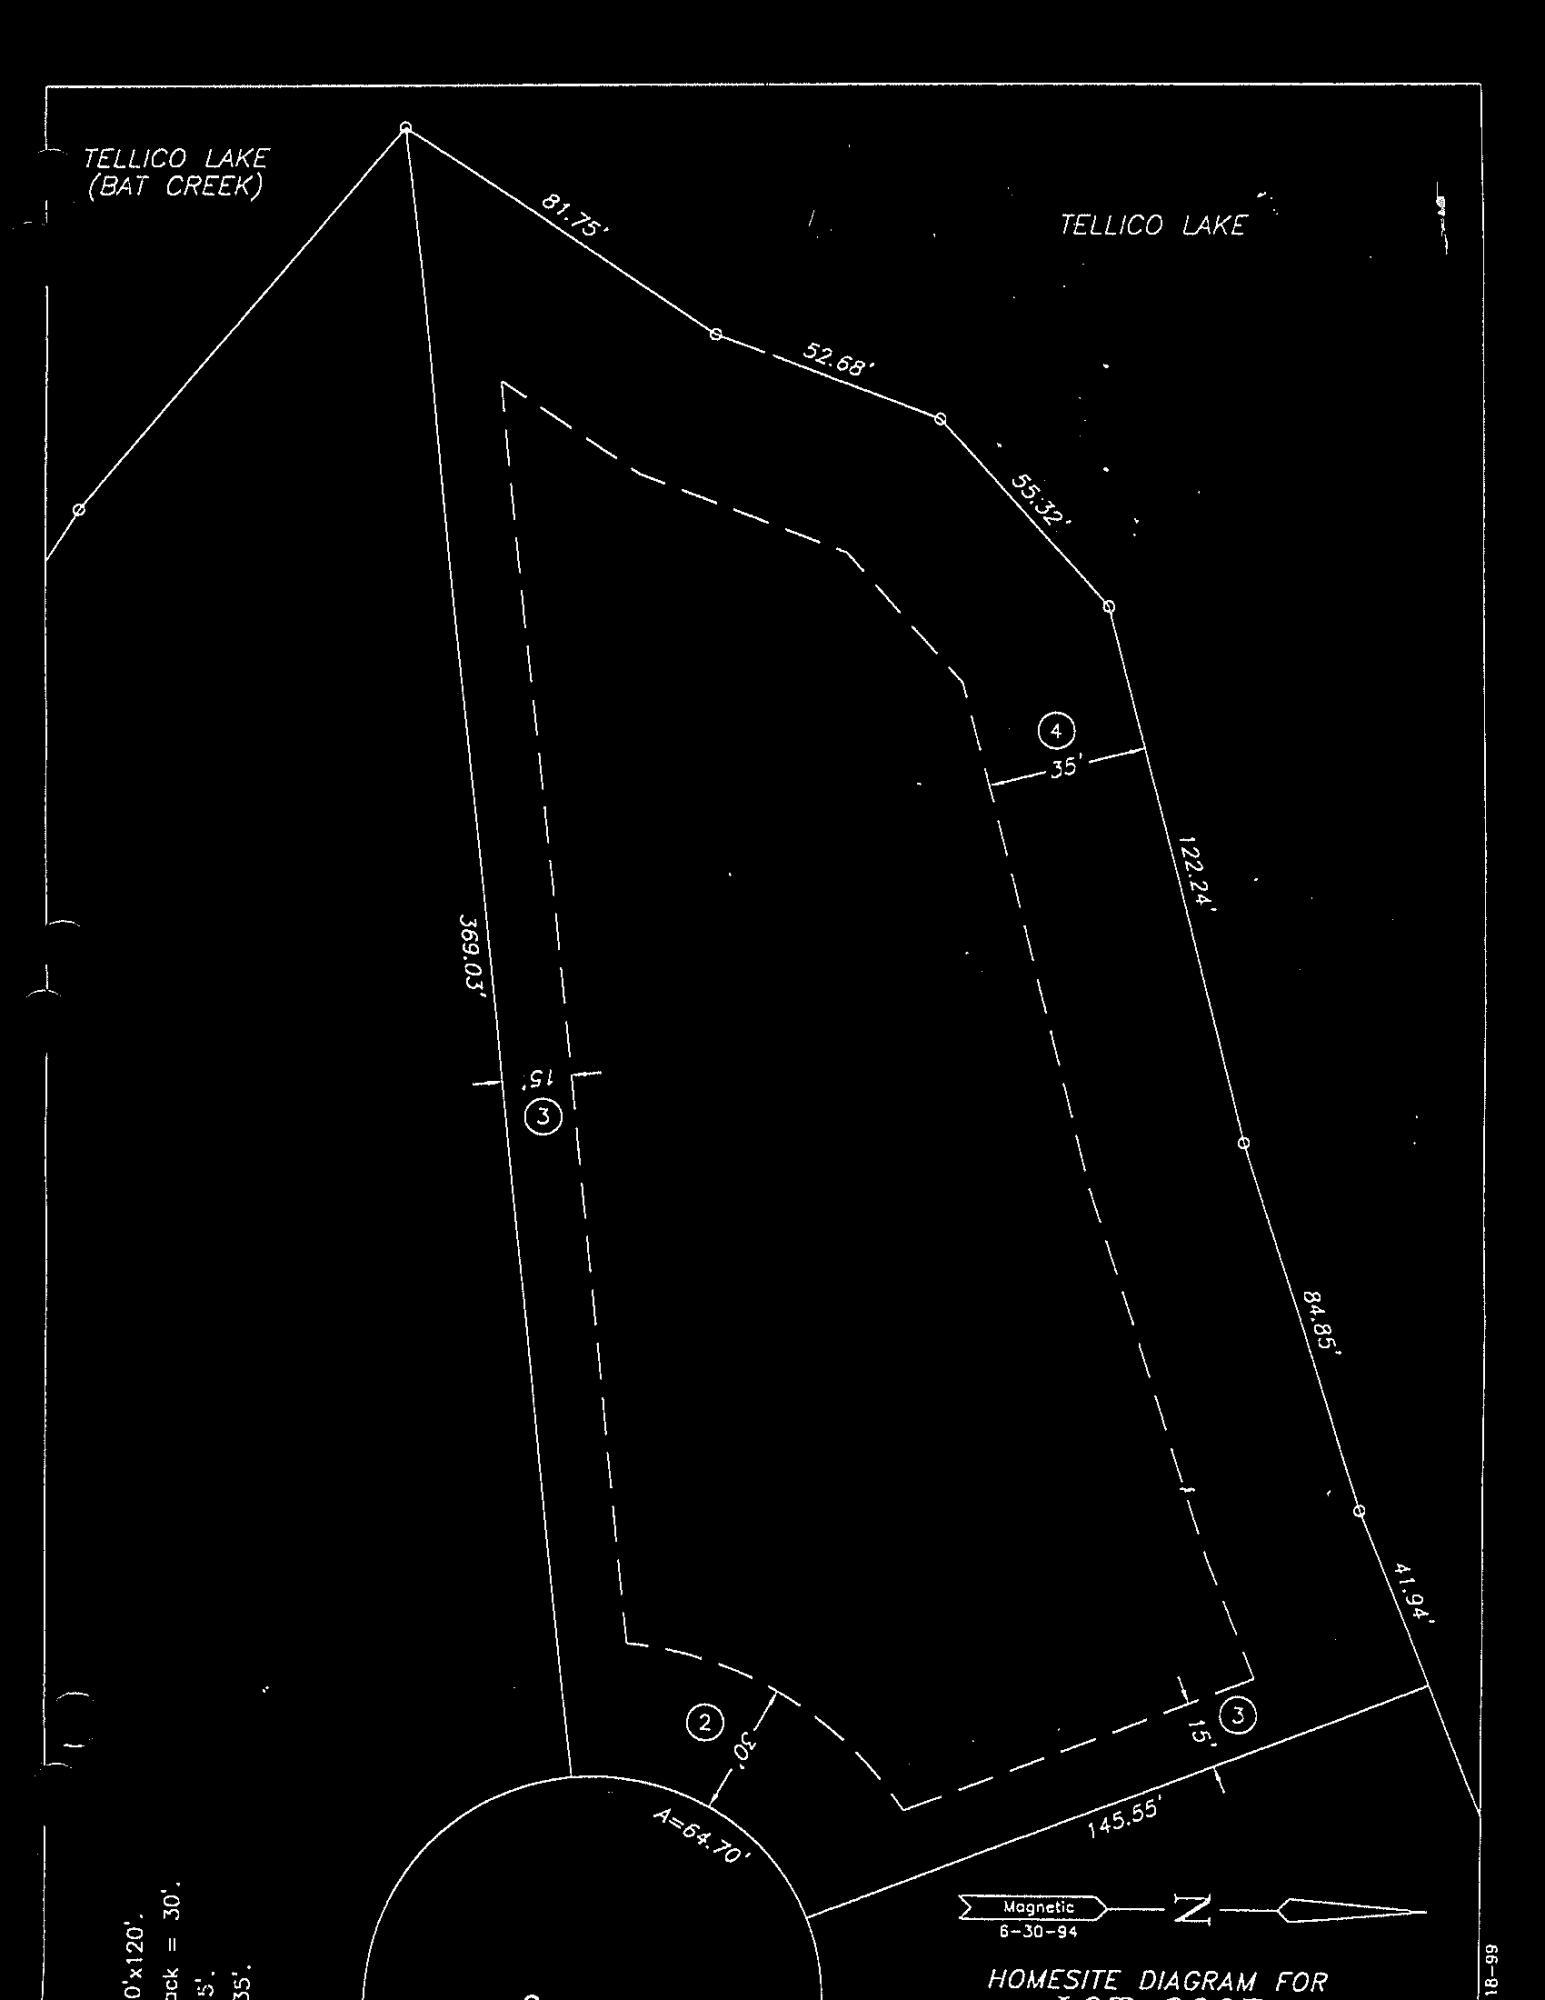 L-889r+890 Bay Pointe Rd: